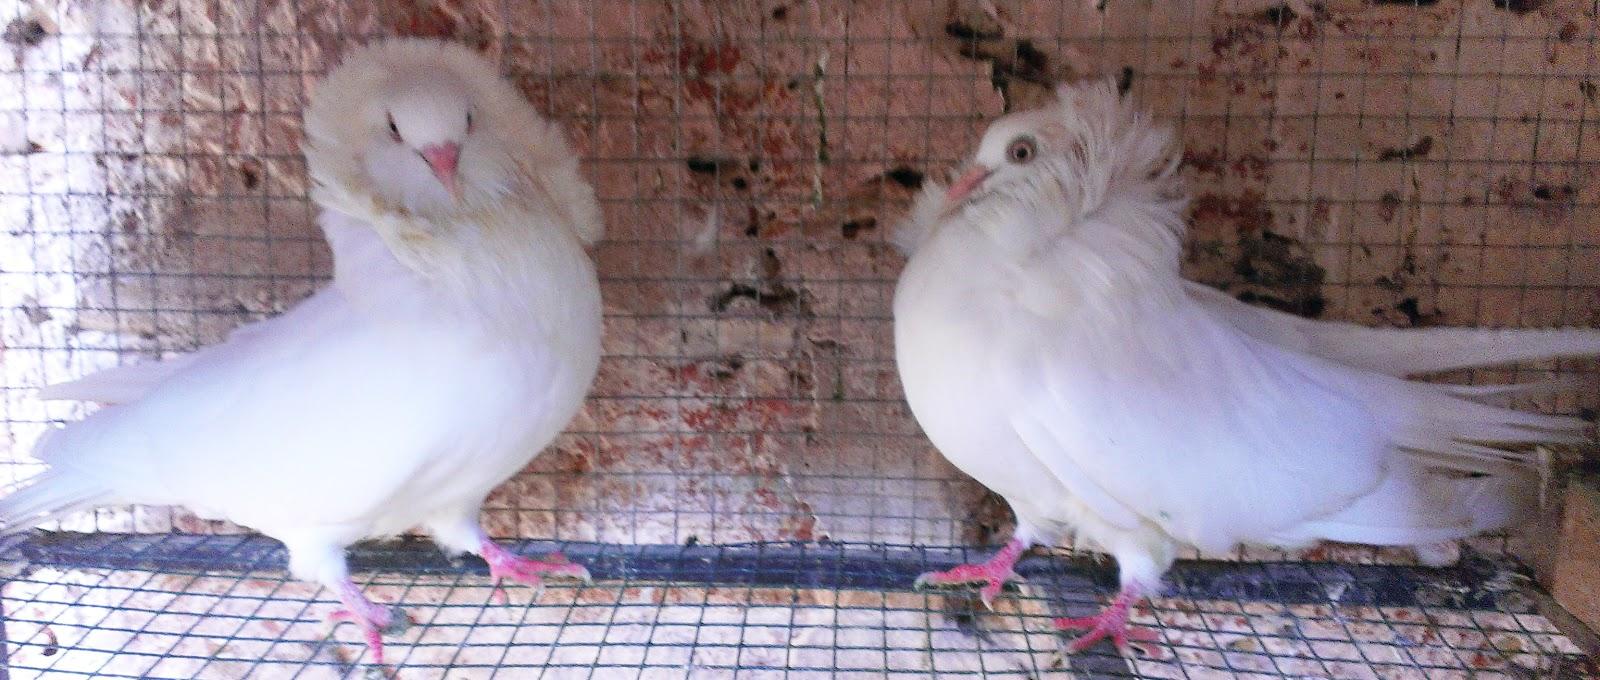 jacobin pigeon - photo #27